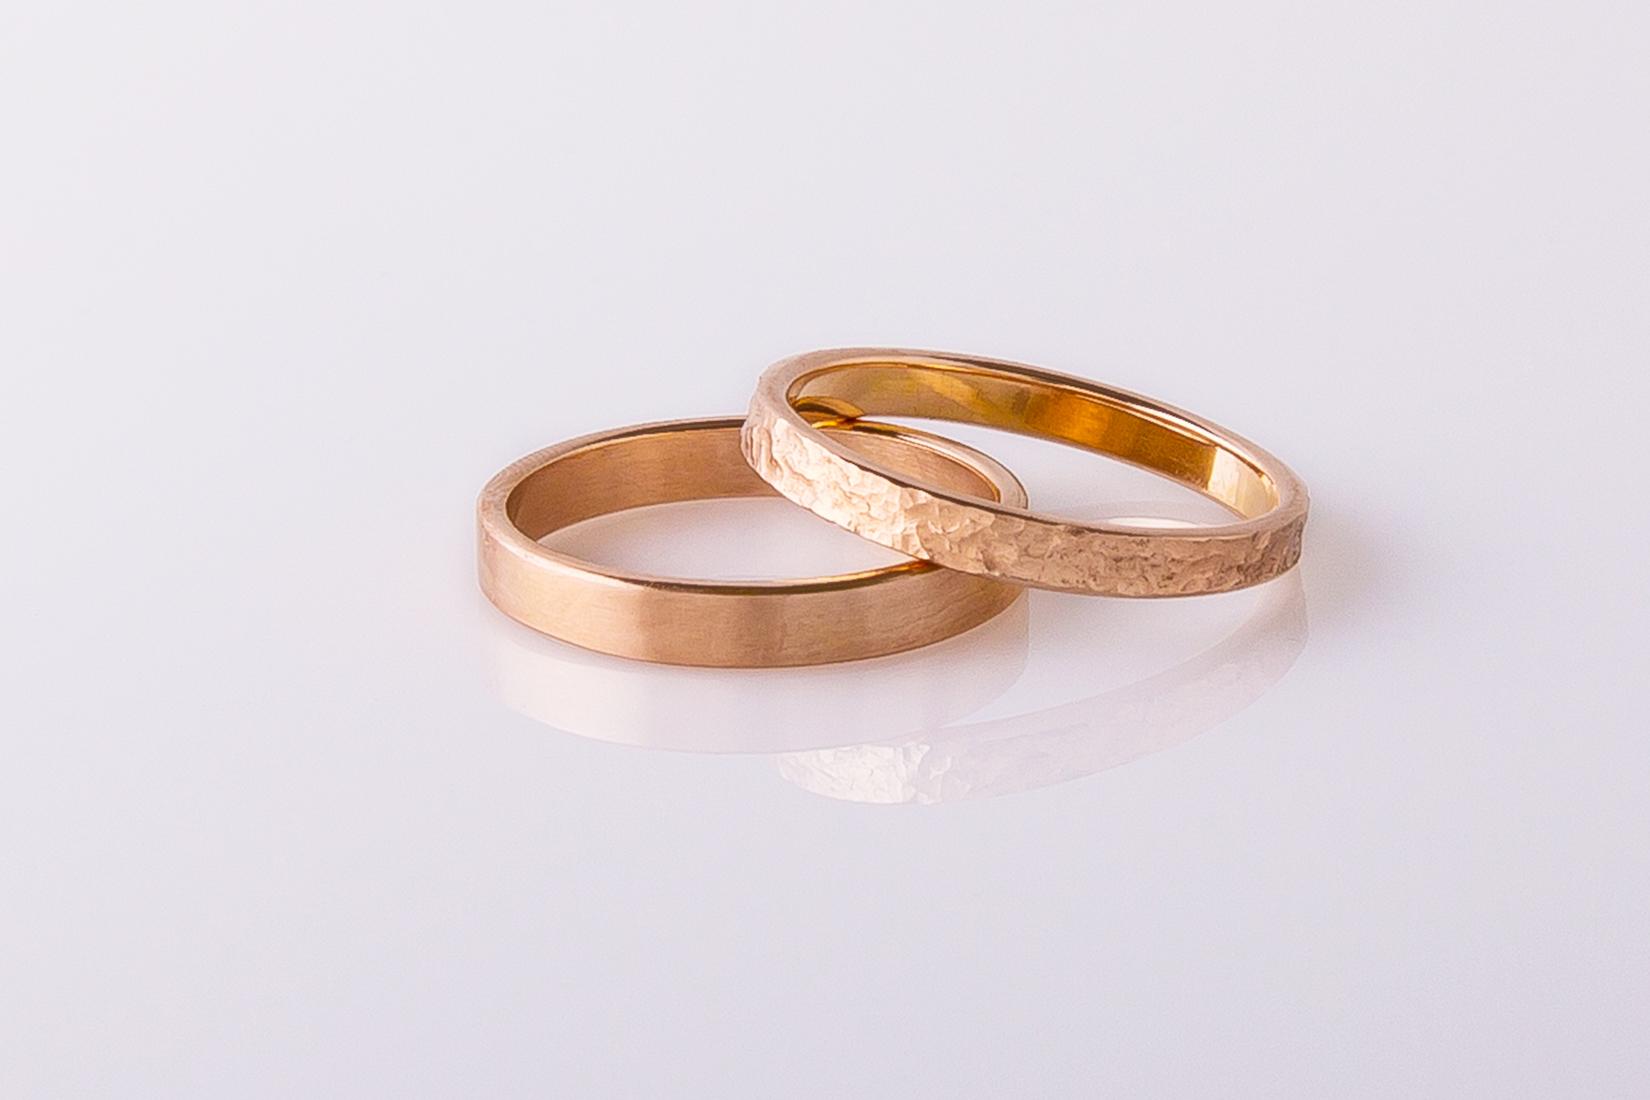 goudmerk-ring-trouwen-rood-goud-gematteerd-grillig-bewerkt